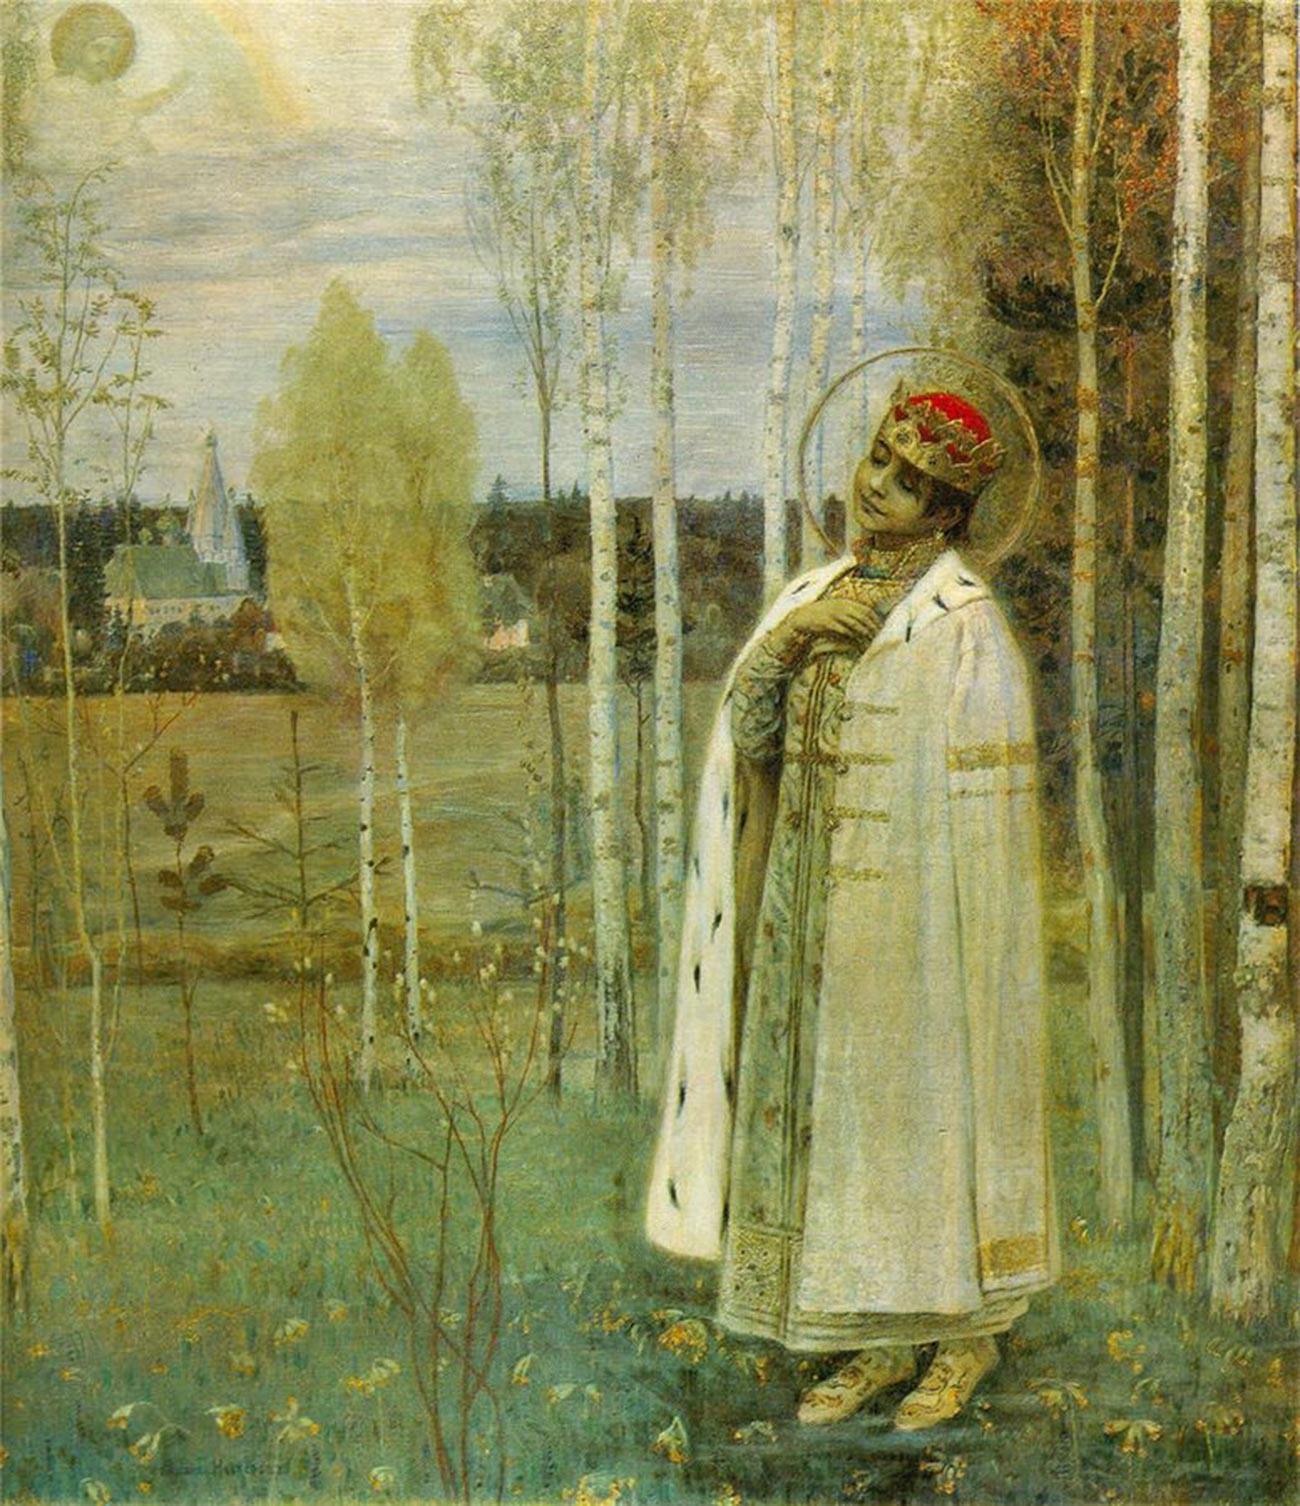 'Tsarevich Dmitry', oleh Mikhail Nesterov.